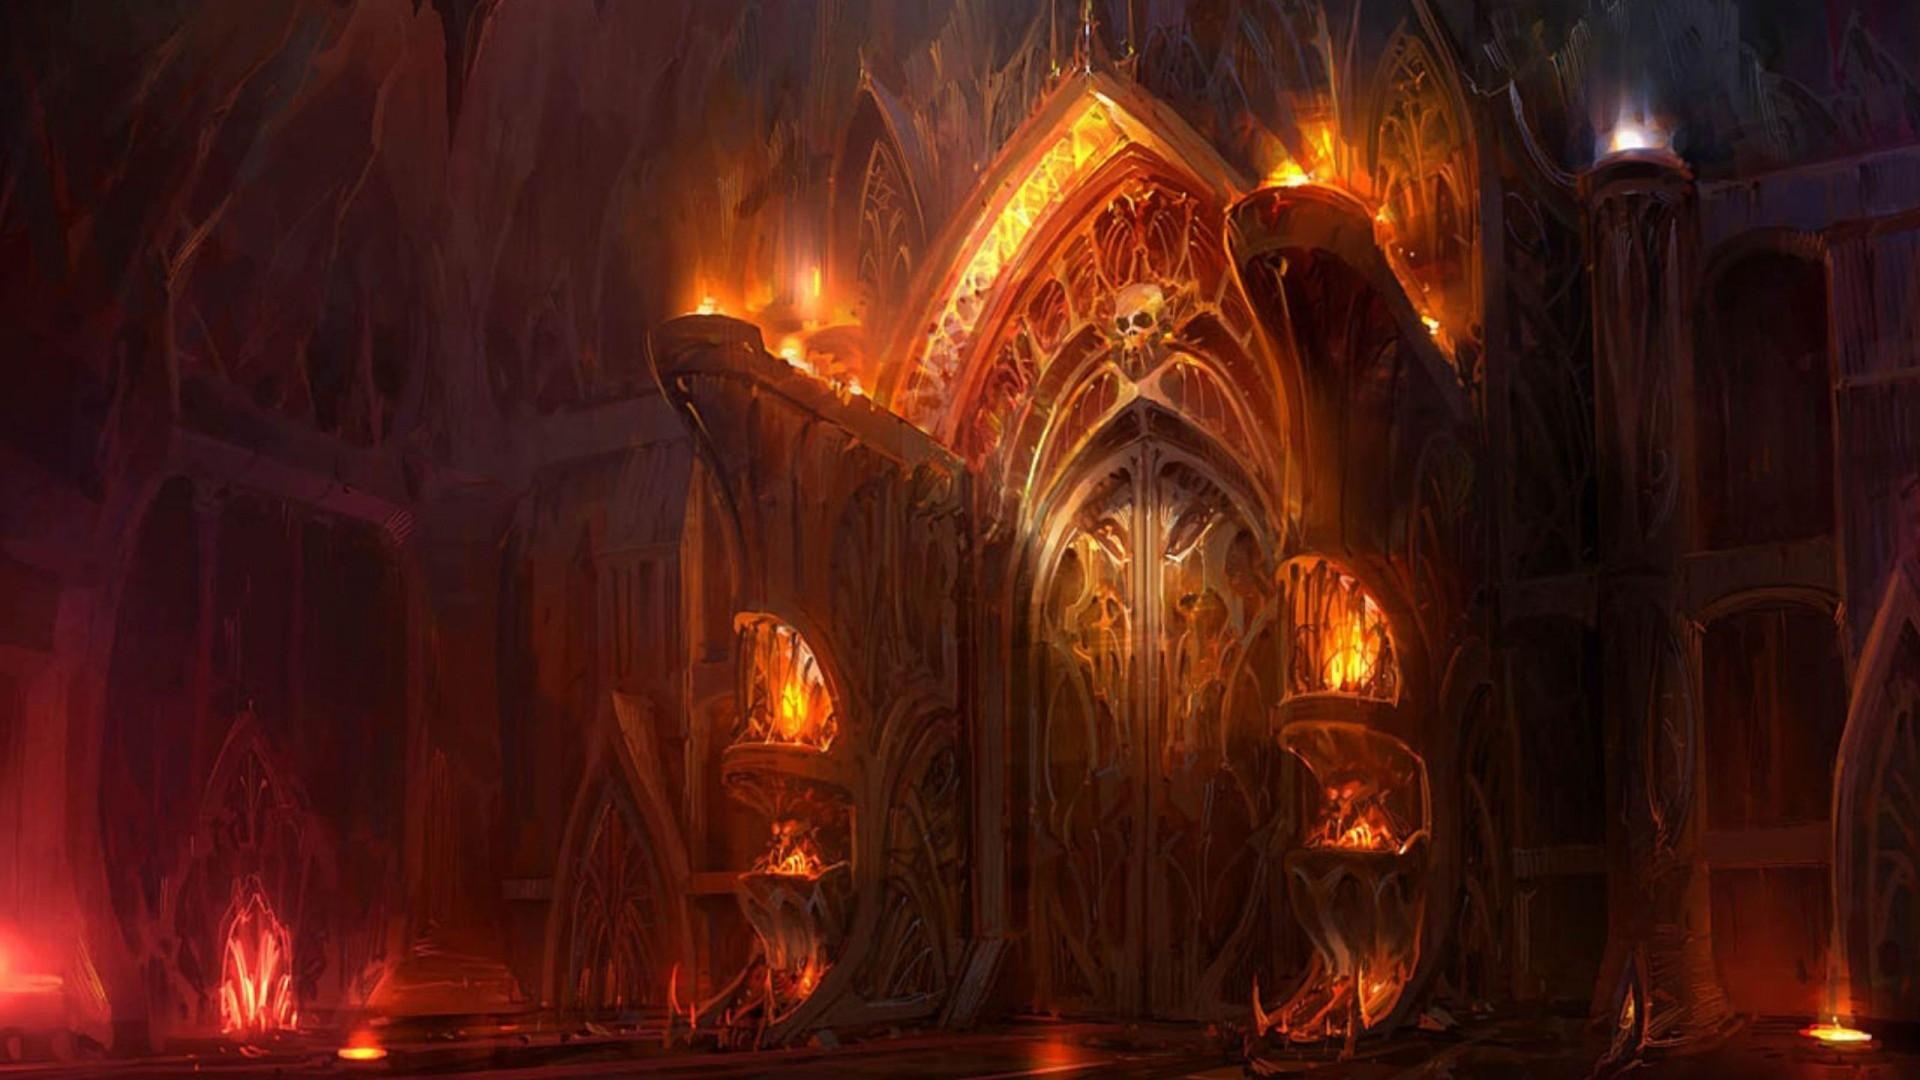 … 5009006_143036734261_Gate-OF-the-Hell-HD-wallpaper.jpg …